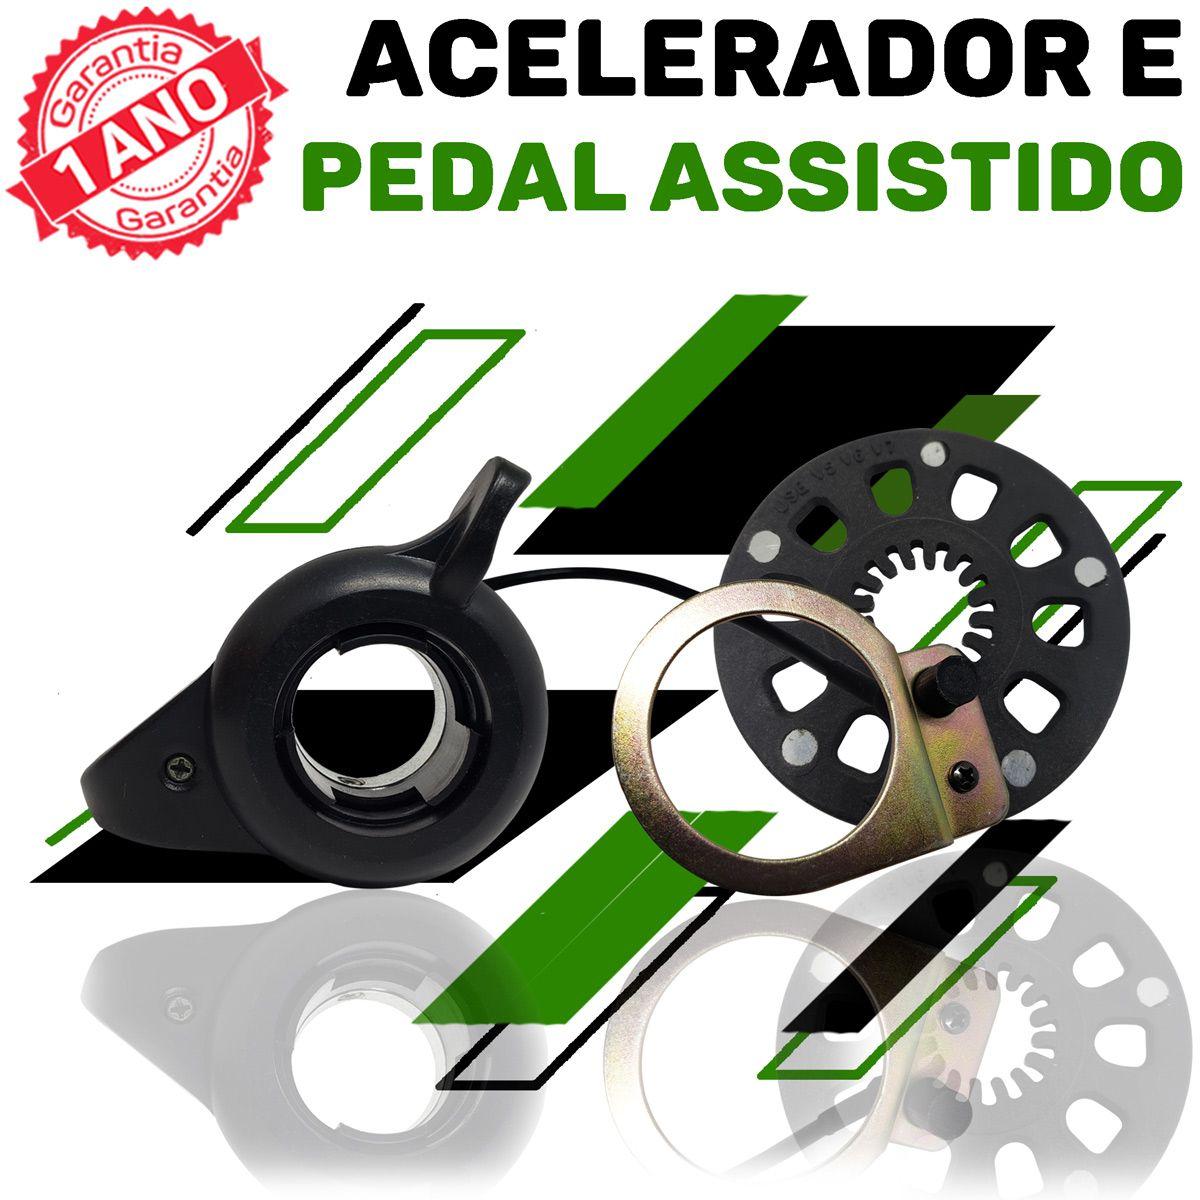 Kit Elétrico para Bicicleta - TecBike - Bateria de Trapézio - 350 Watts 36V - Aro 26